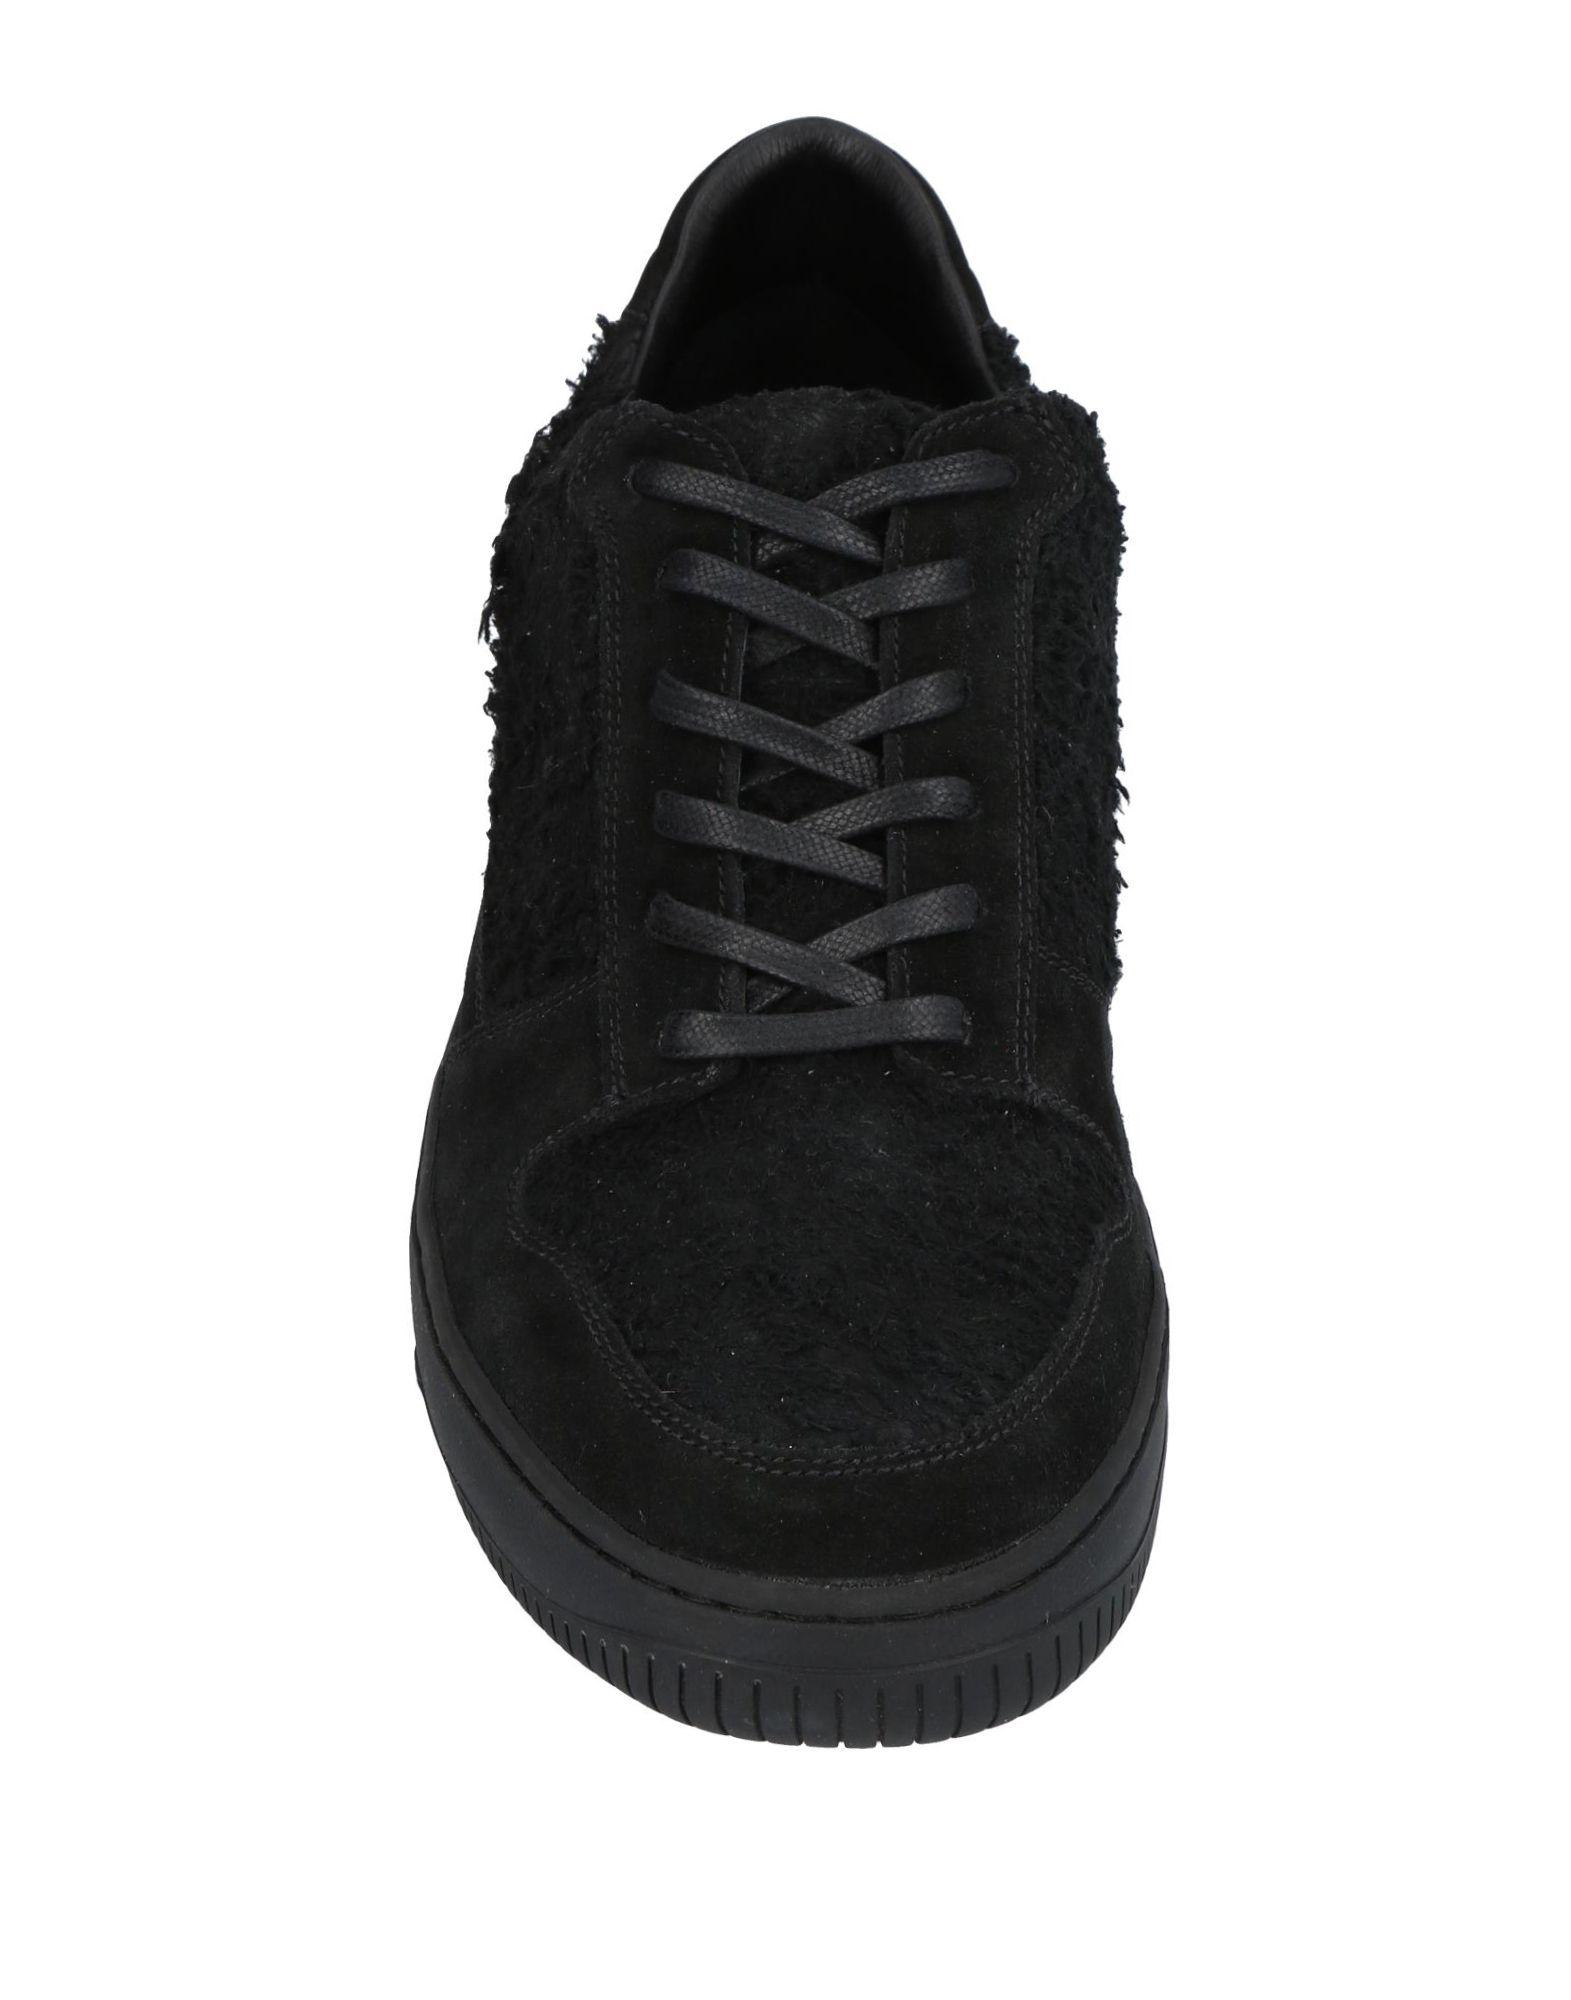 Diemme Gute Sneakers Herren  11418886NB Gute Diemme Qualität beliebte Schuhe 653799